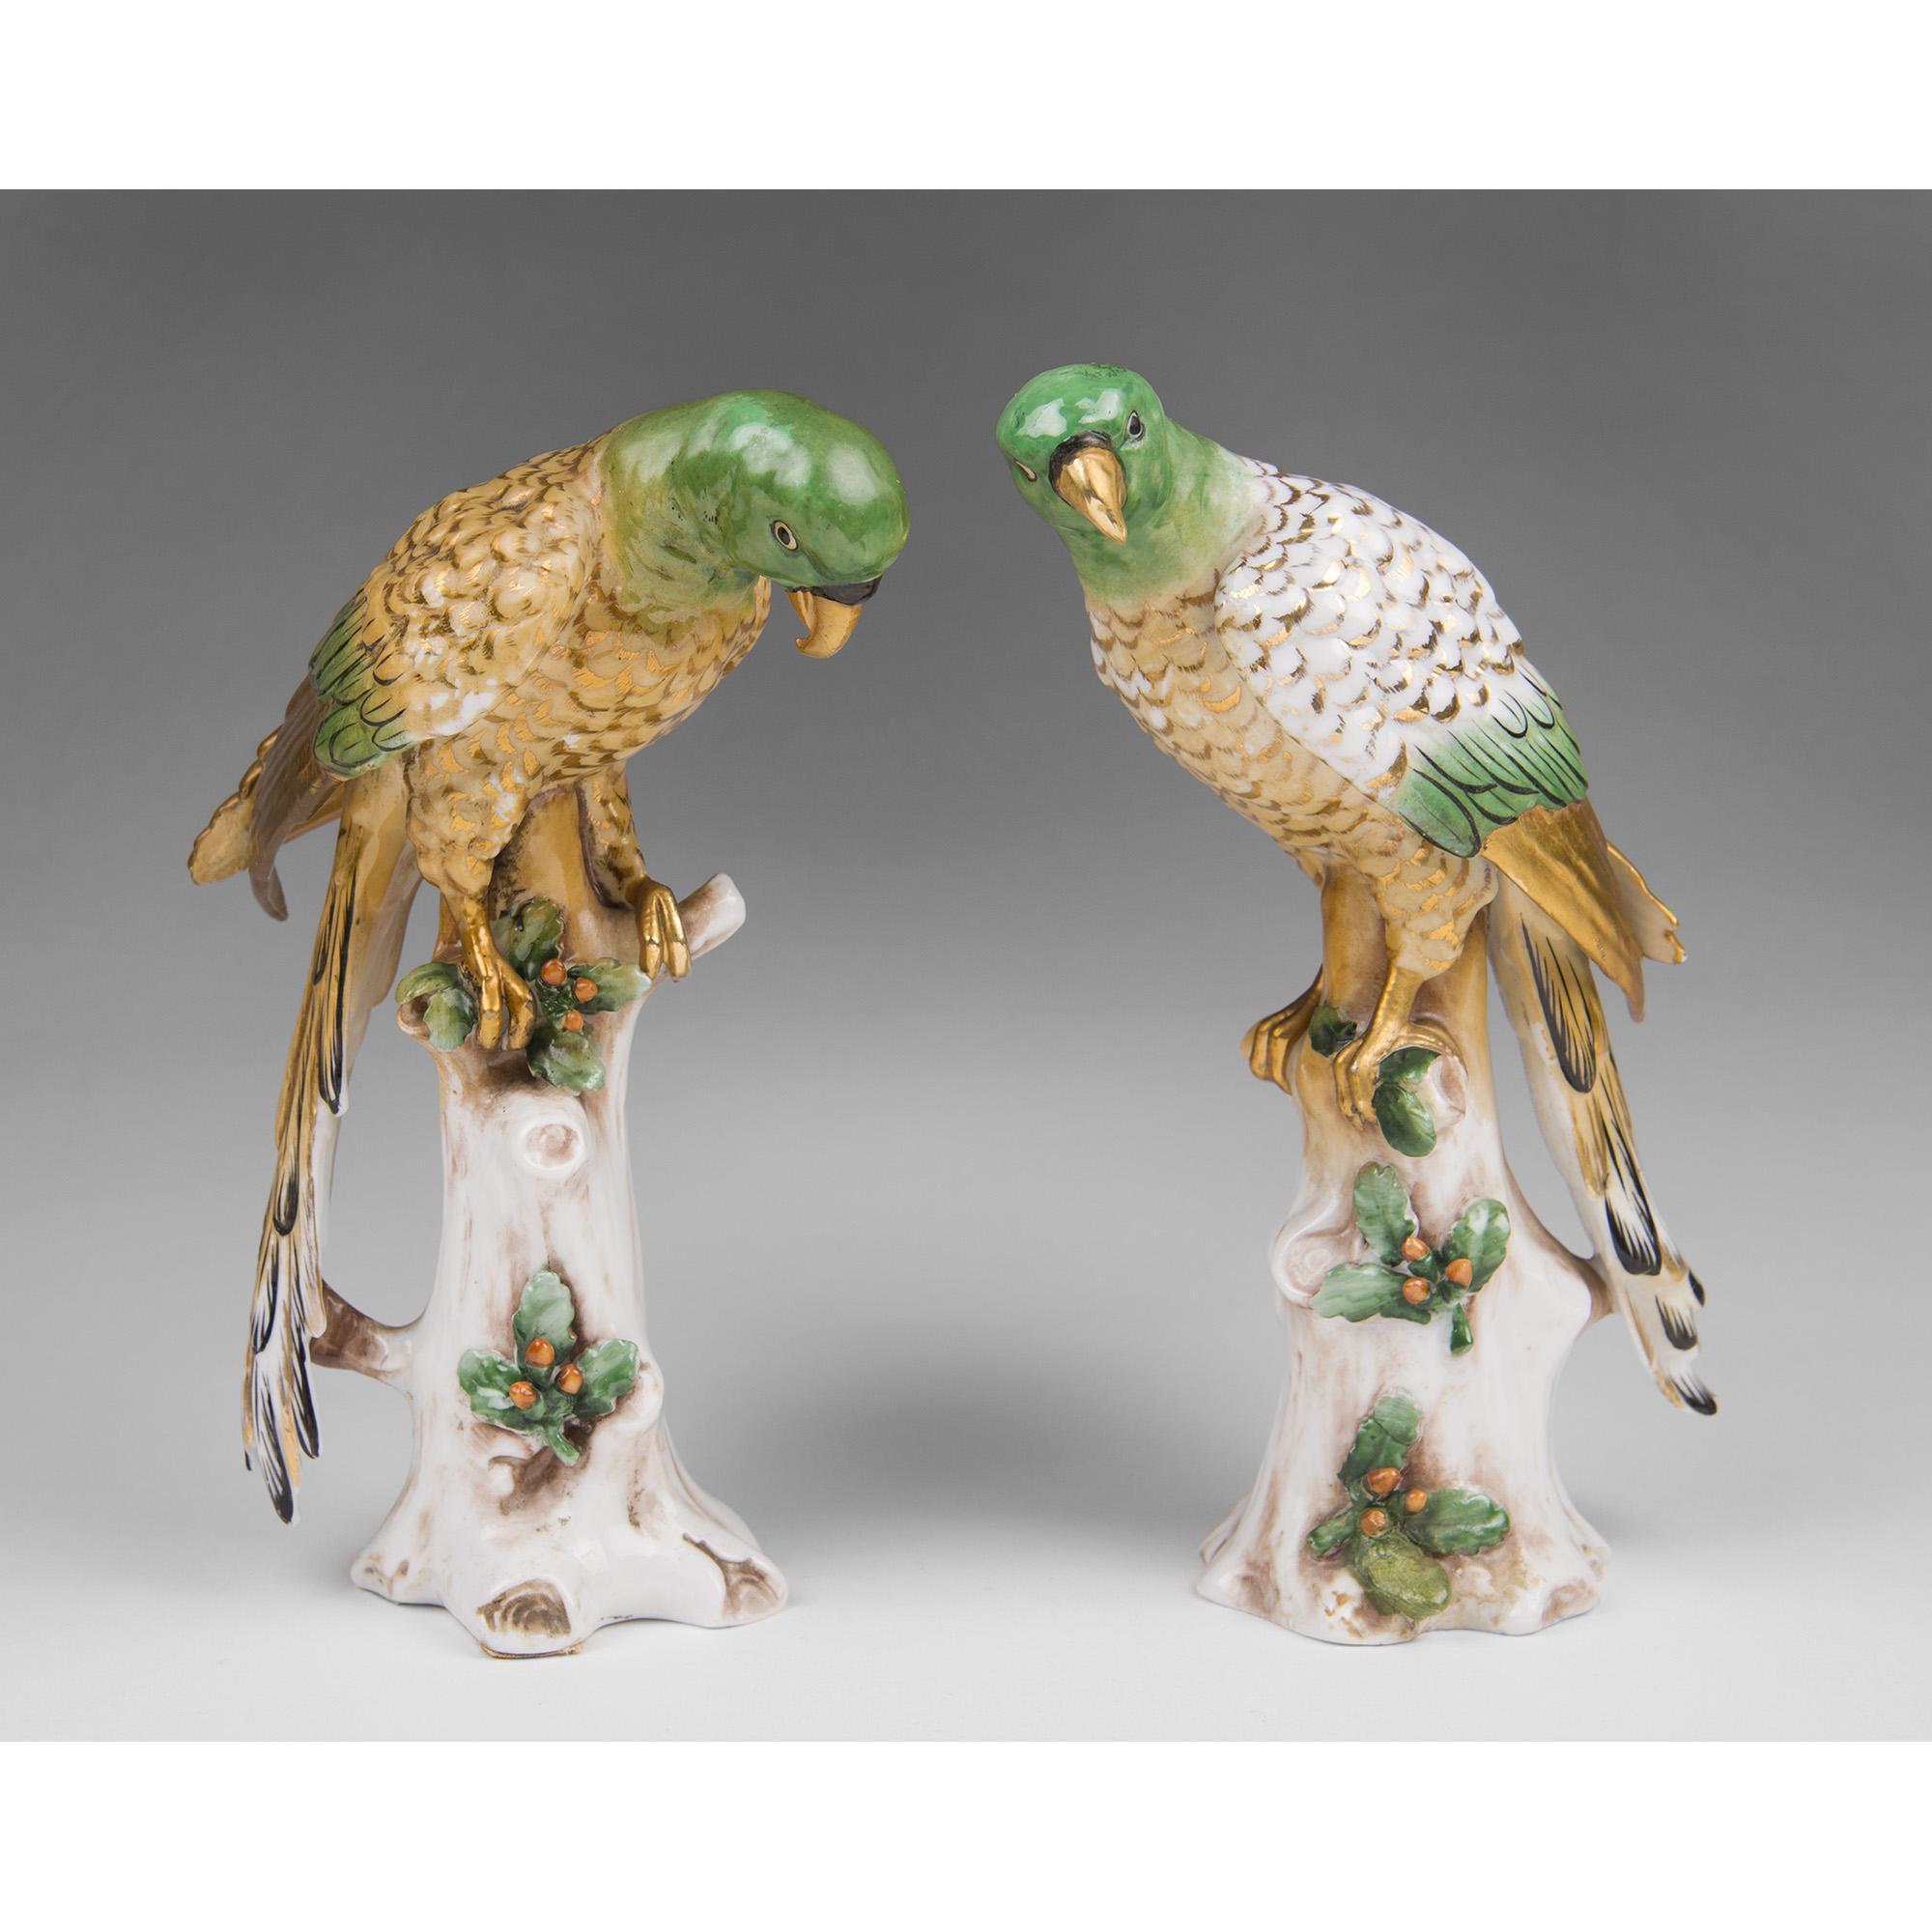 Pair of Late 19th C. Samson Porcelain Parrots, Gold Anchor Mark